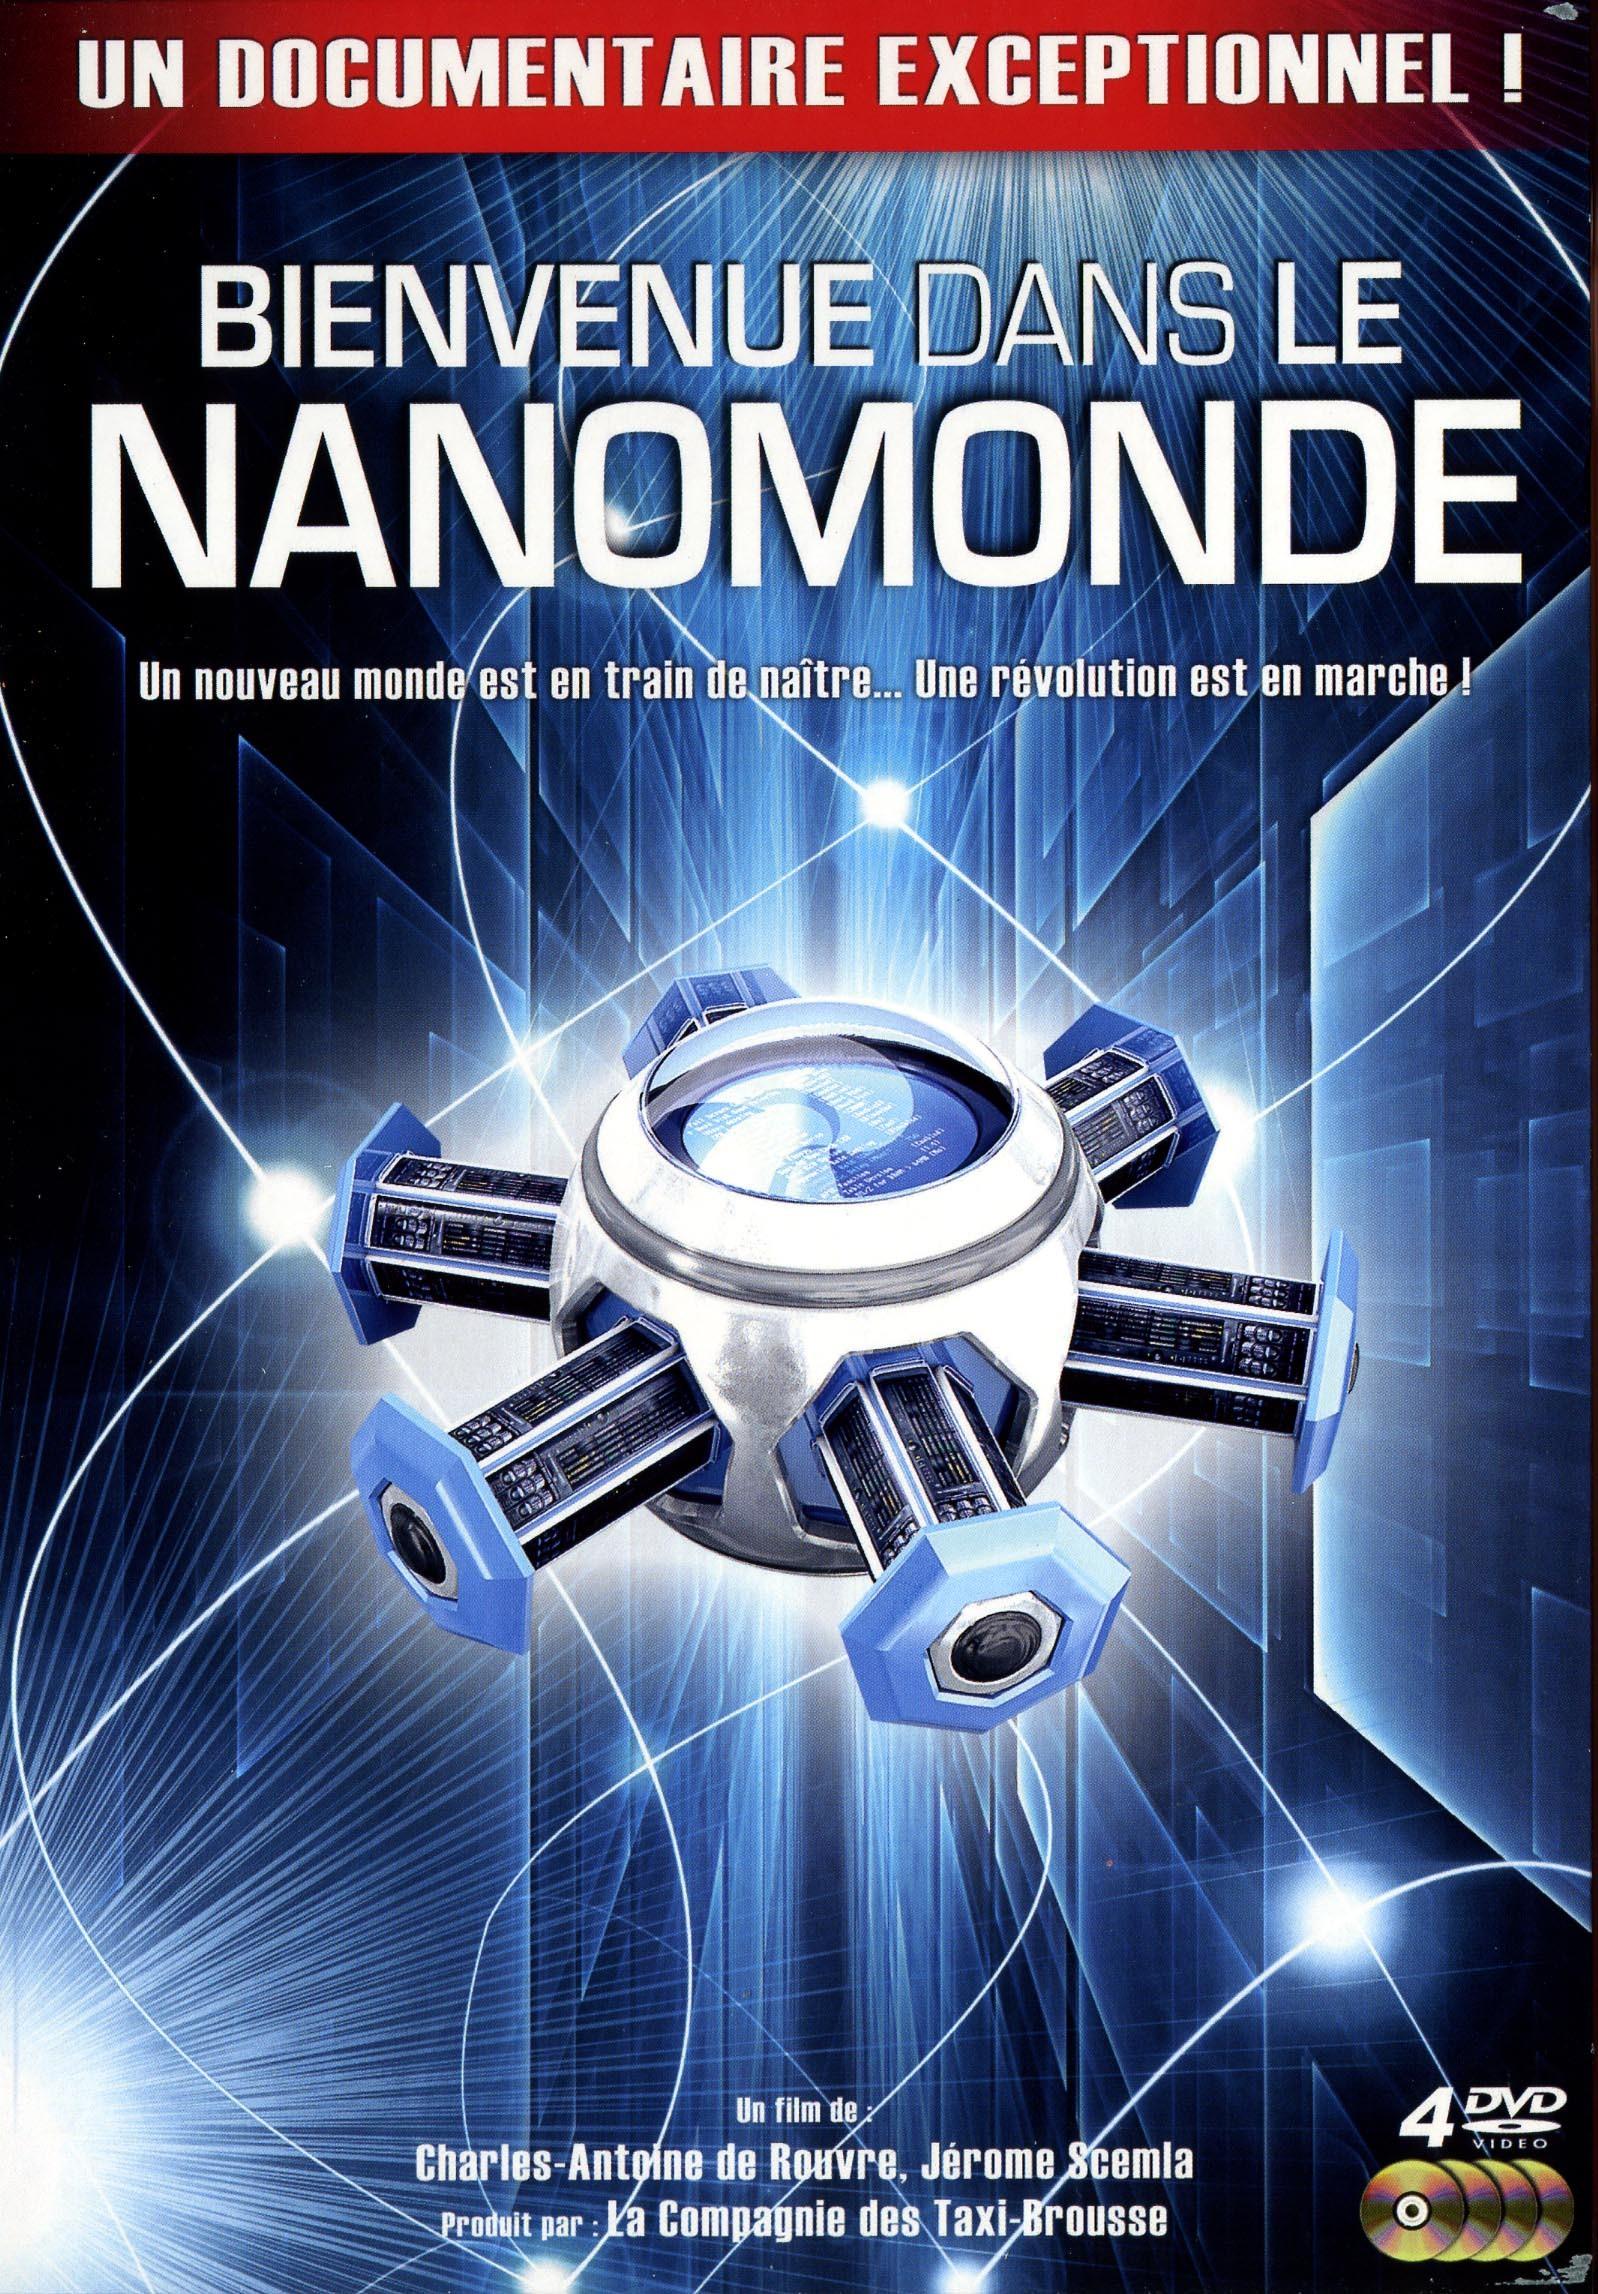 BIENVENUE DANS LE NANOMONDE - 4 DVD